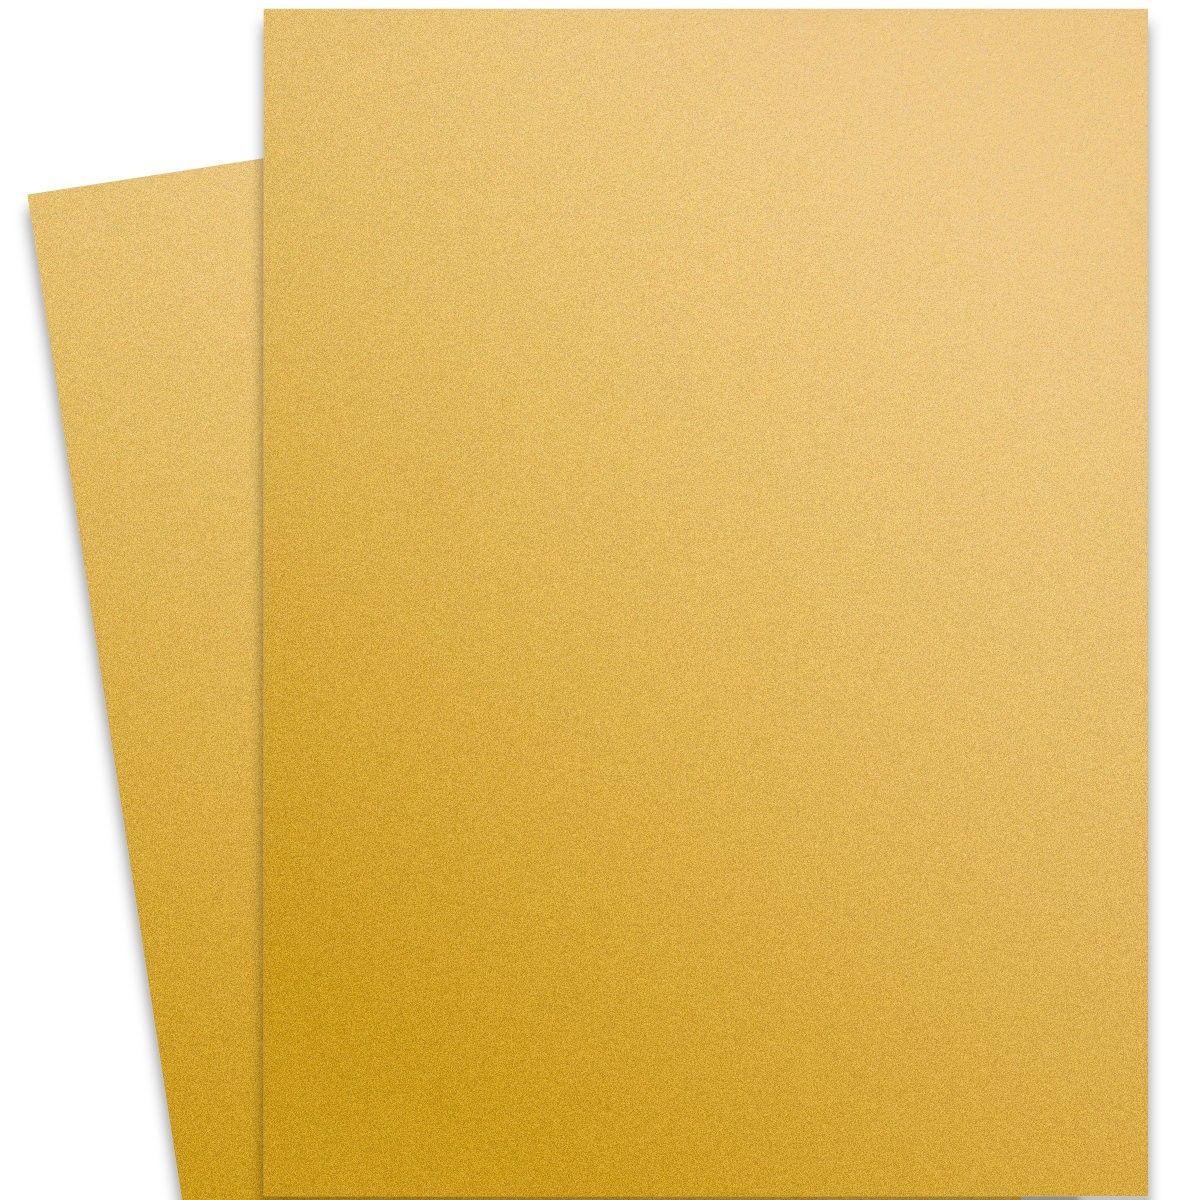 Curious Metallic Super Gold 27x39 Full Size Card Stock Paper 111lb Cover In 2020 Cardstock Paper Gold Paper Paper